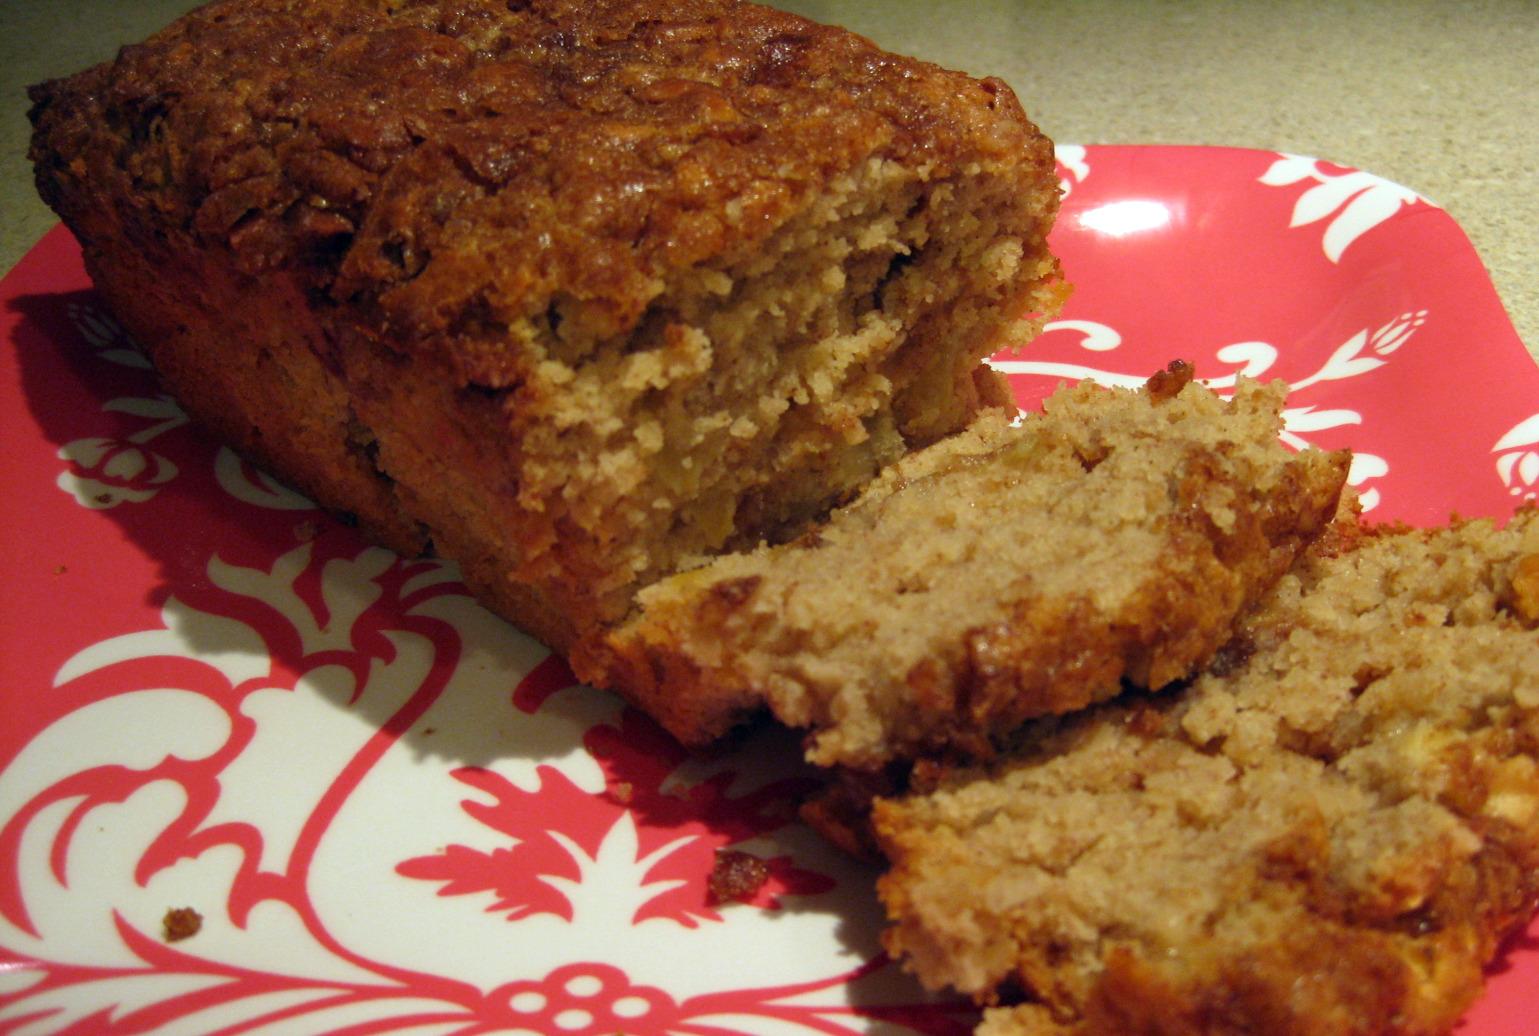 Cinnamon Apple Streusel Amish Friendship Bread Tasty Kitchen A Happy Recipe Community